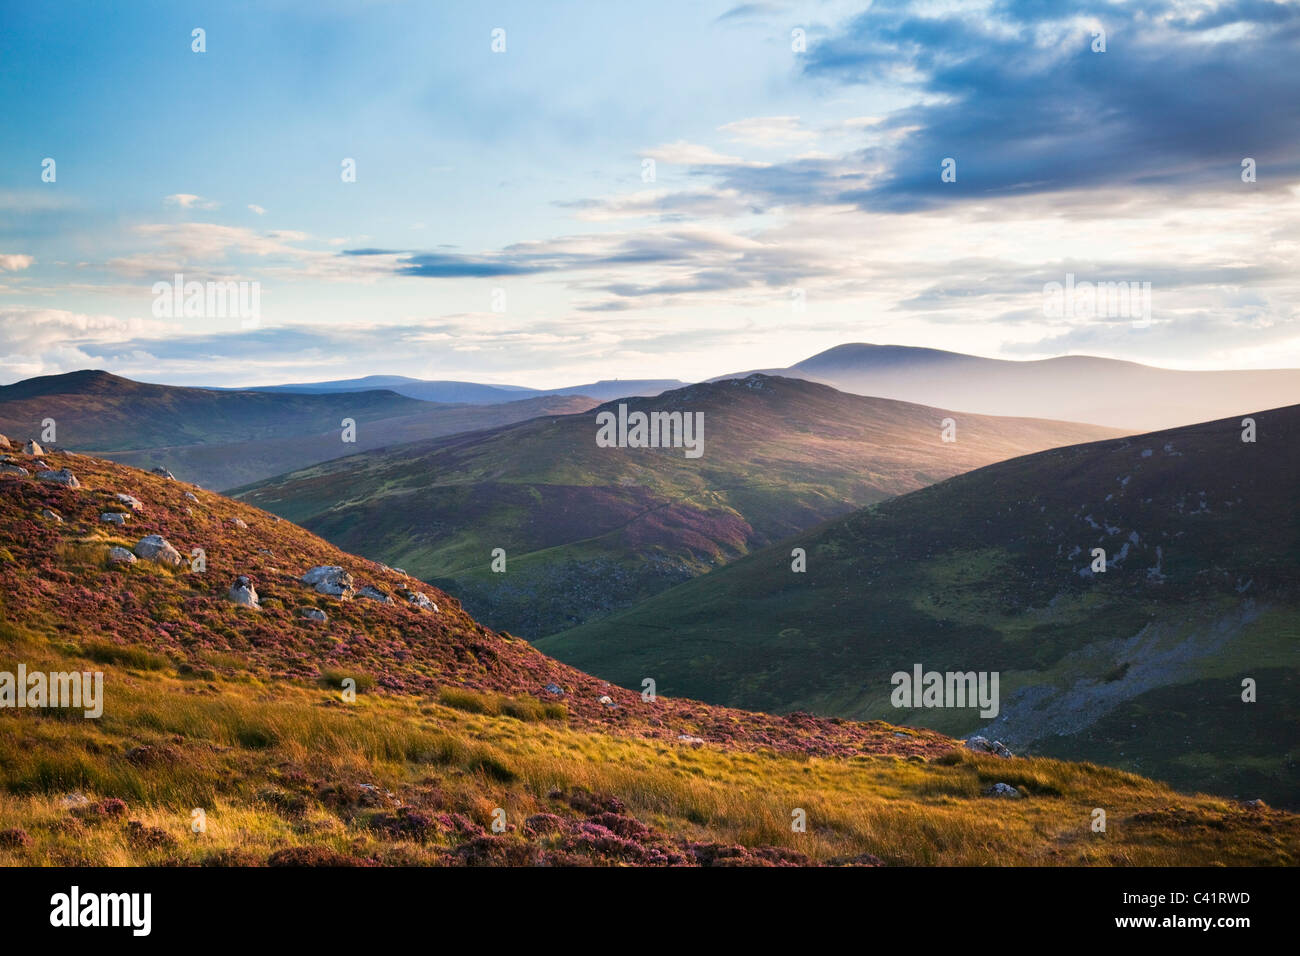 Serata in Wicklow Mountains, County Wicklow, Irlanda. Immagini Stock